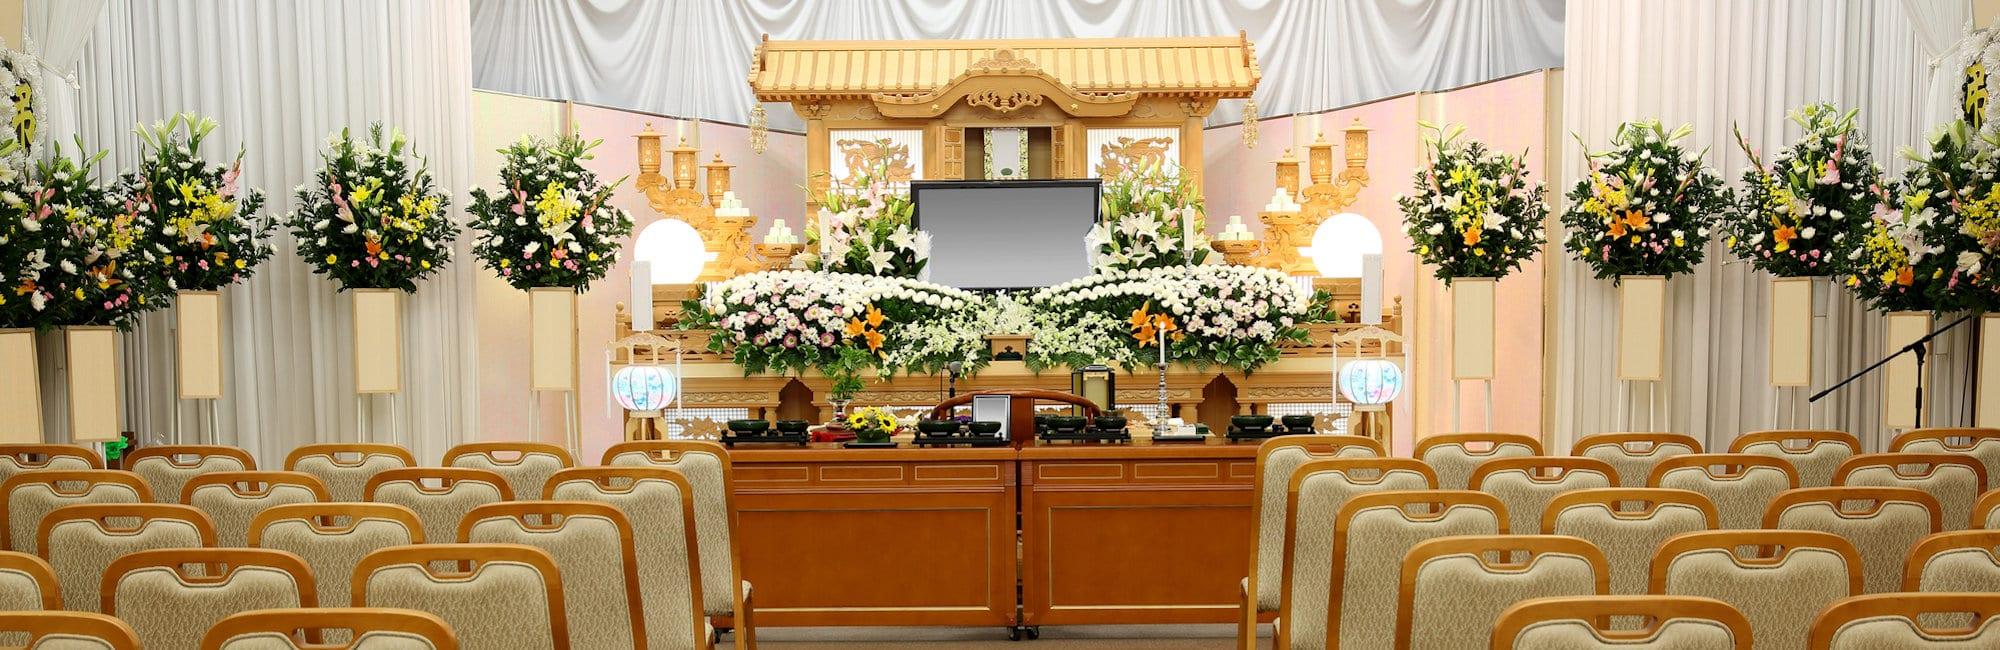 slide-funeral-services-planning